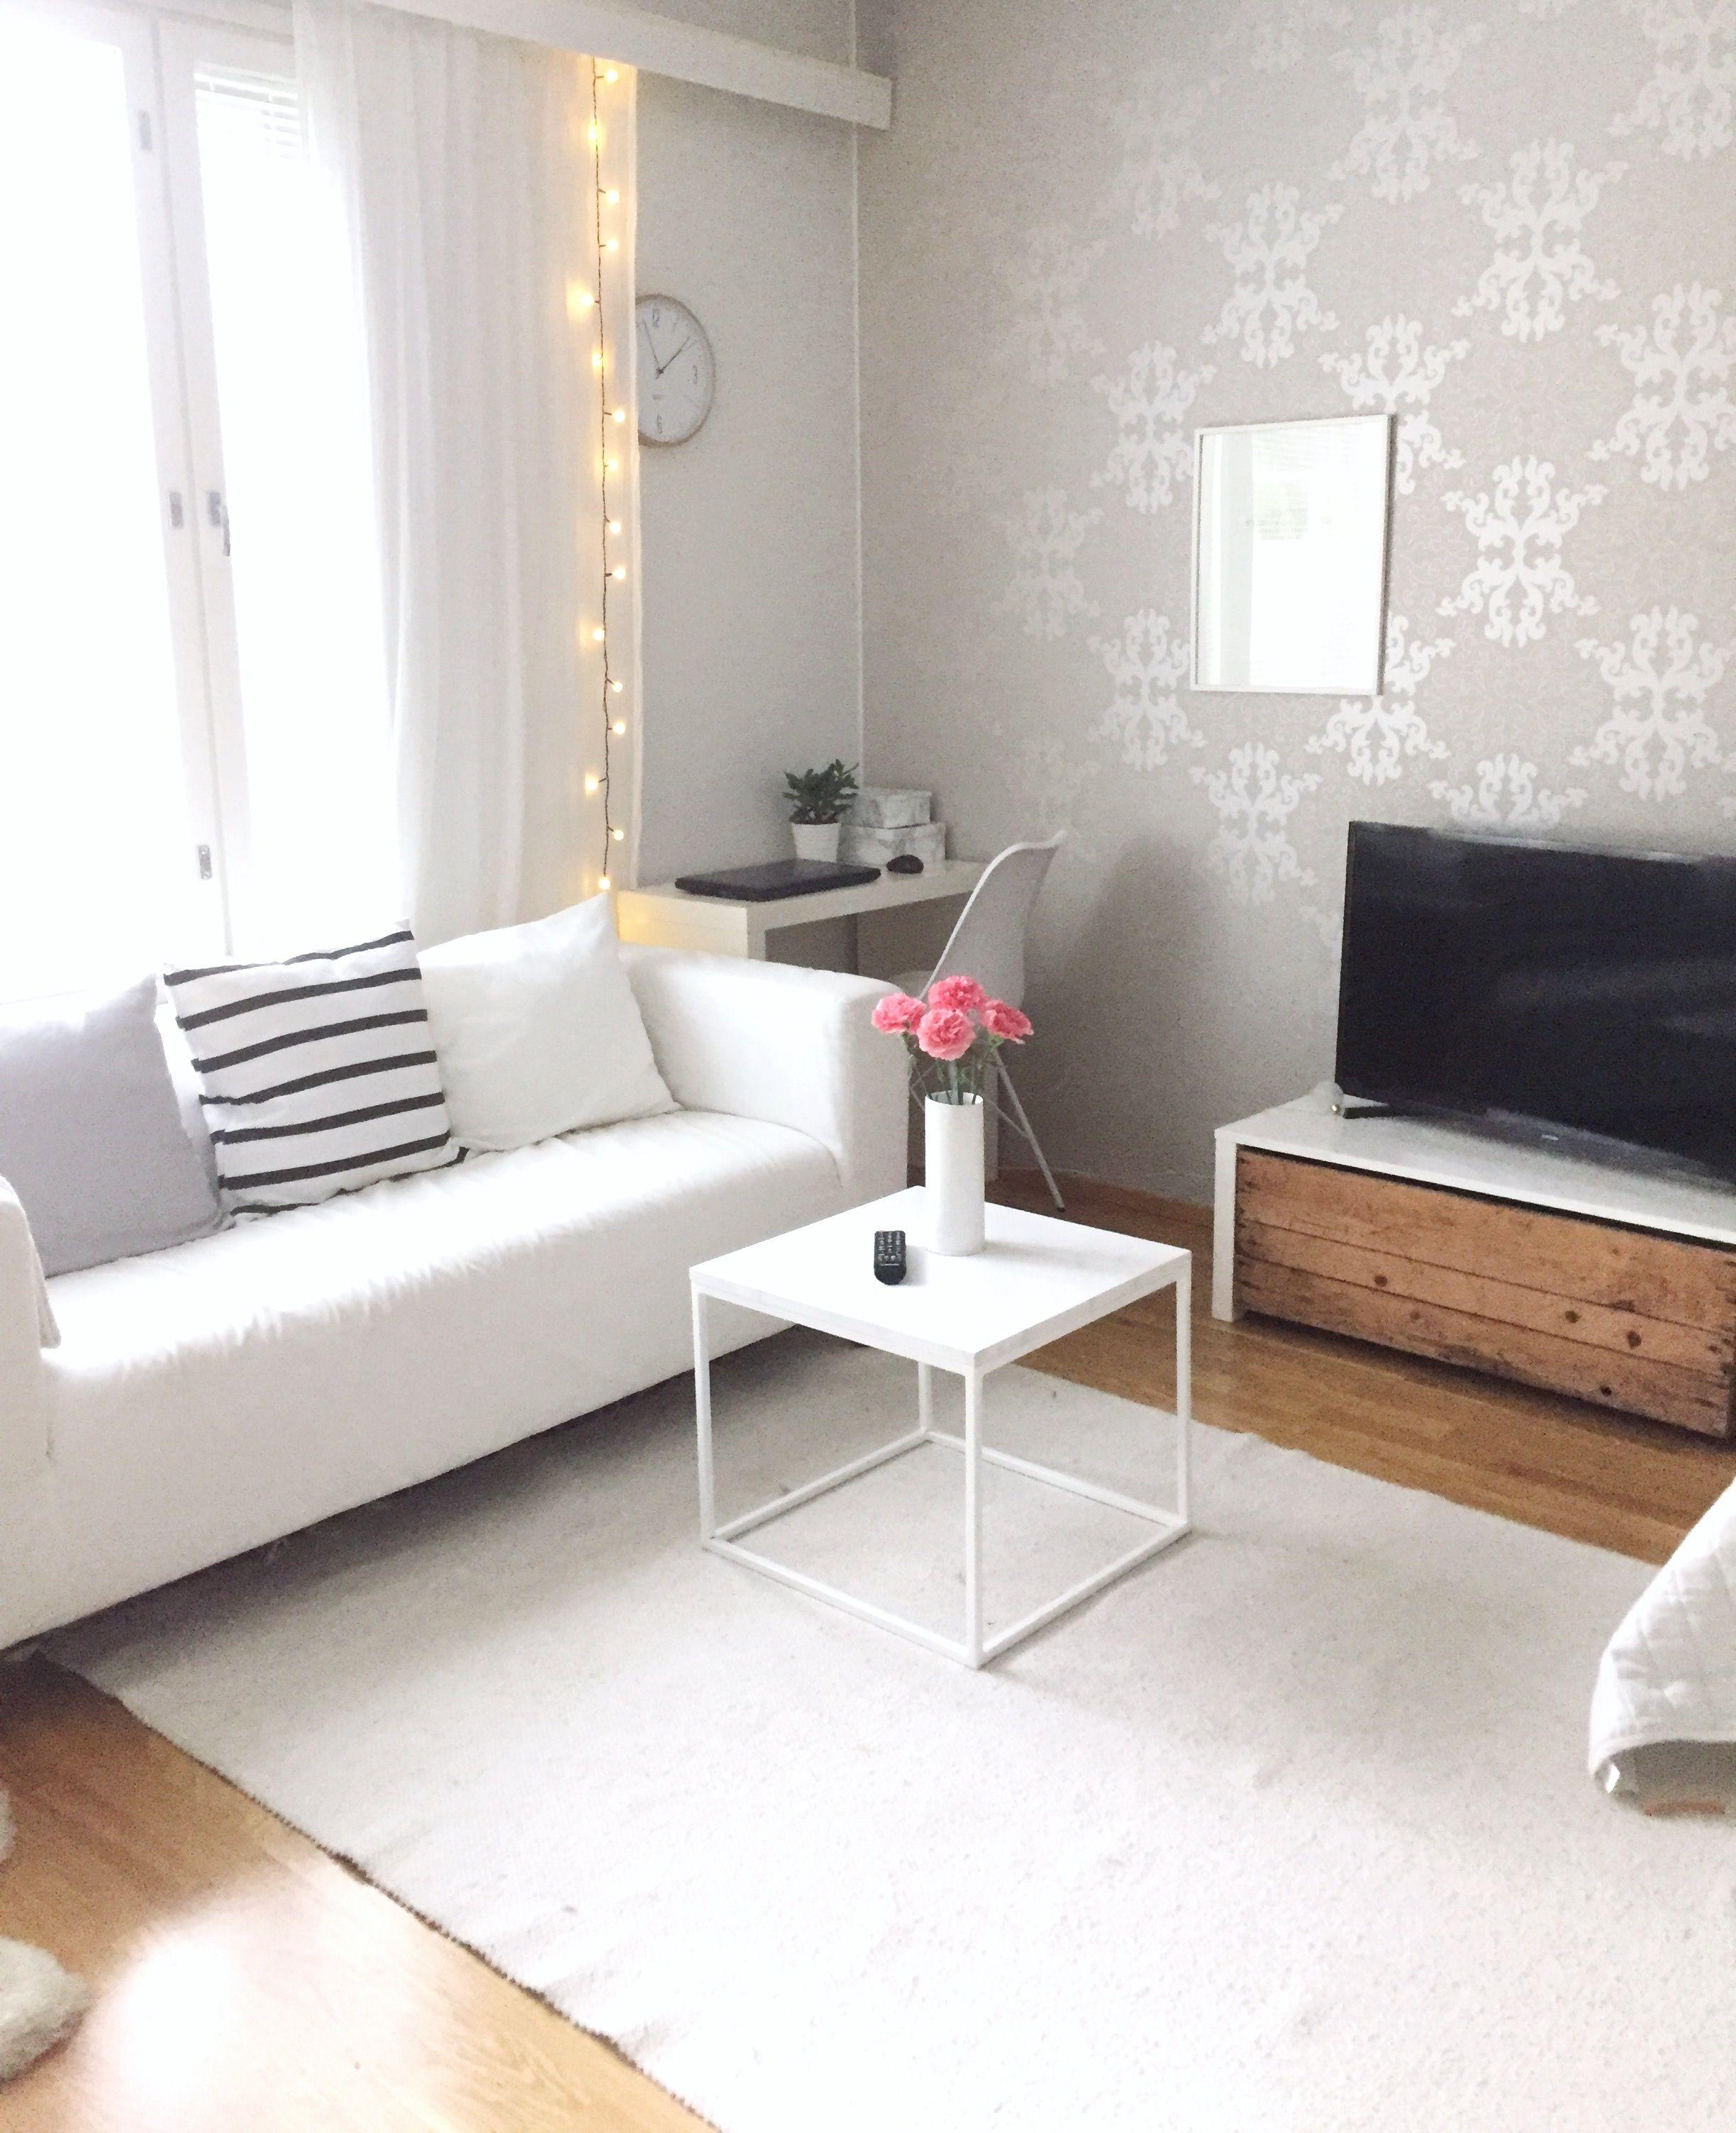 30 Small Bedroom Interior Designs Created To Enlargen Your: Yksiö, Yksiön Sisustaminen, Olohuone, Livingroom, Diy